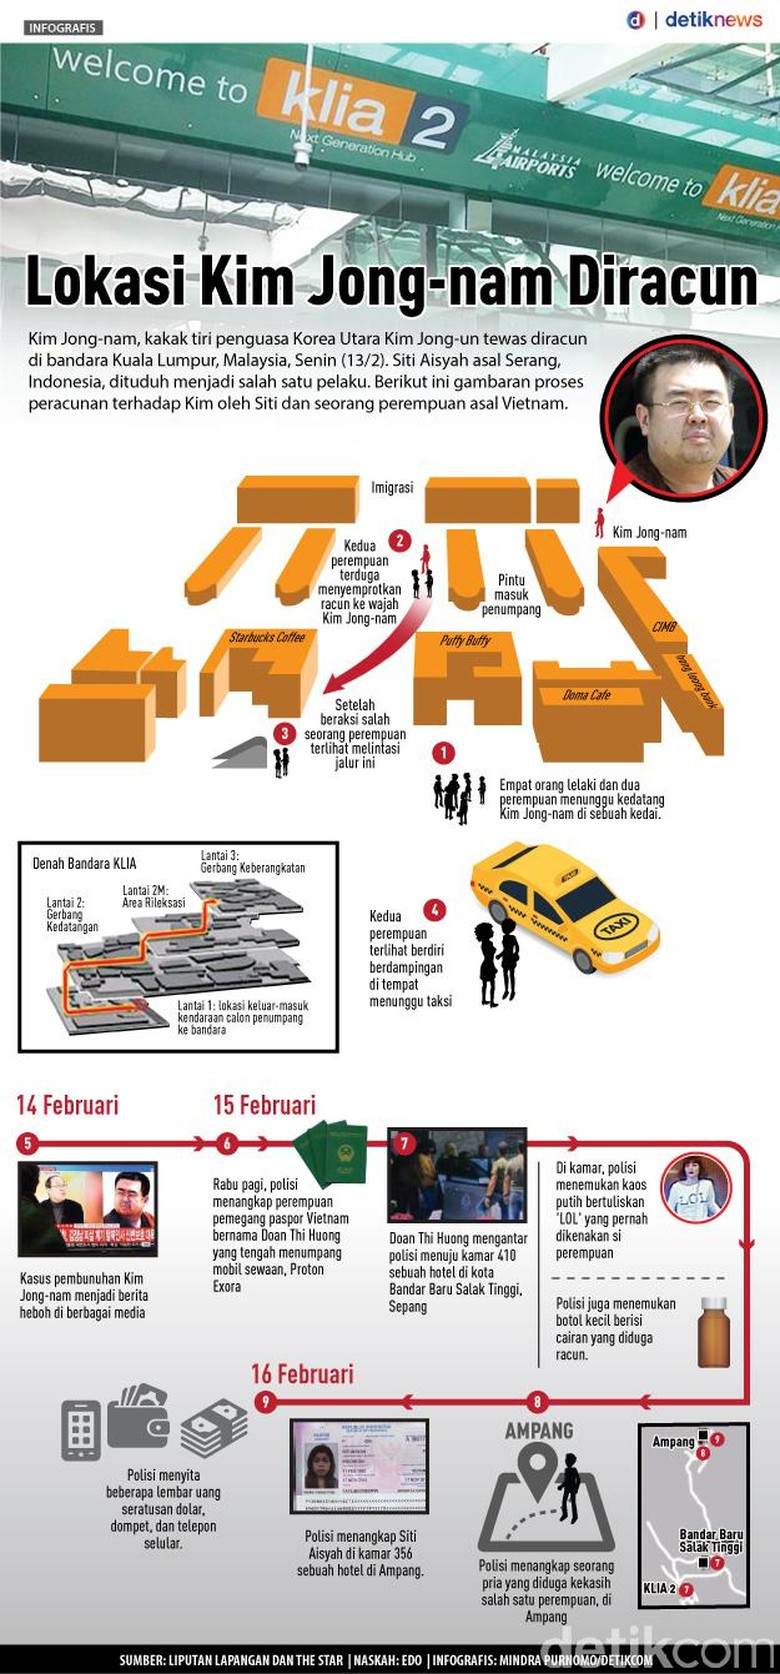 Lokasi Pembunuhan Kim Jong-Nam